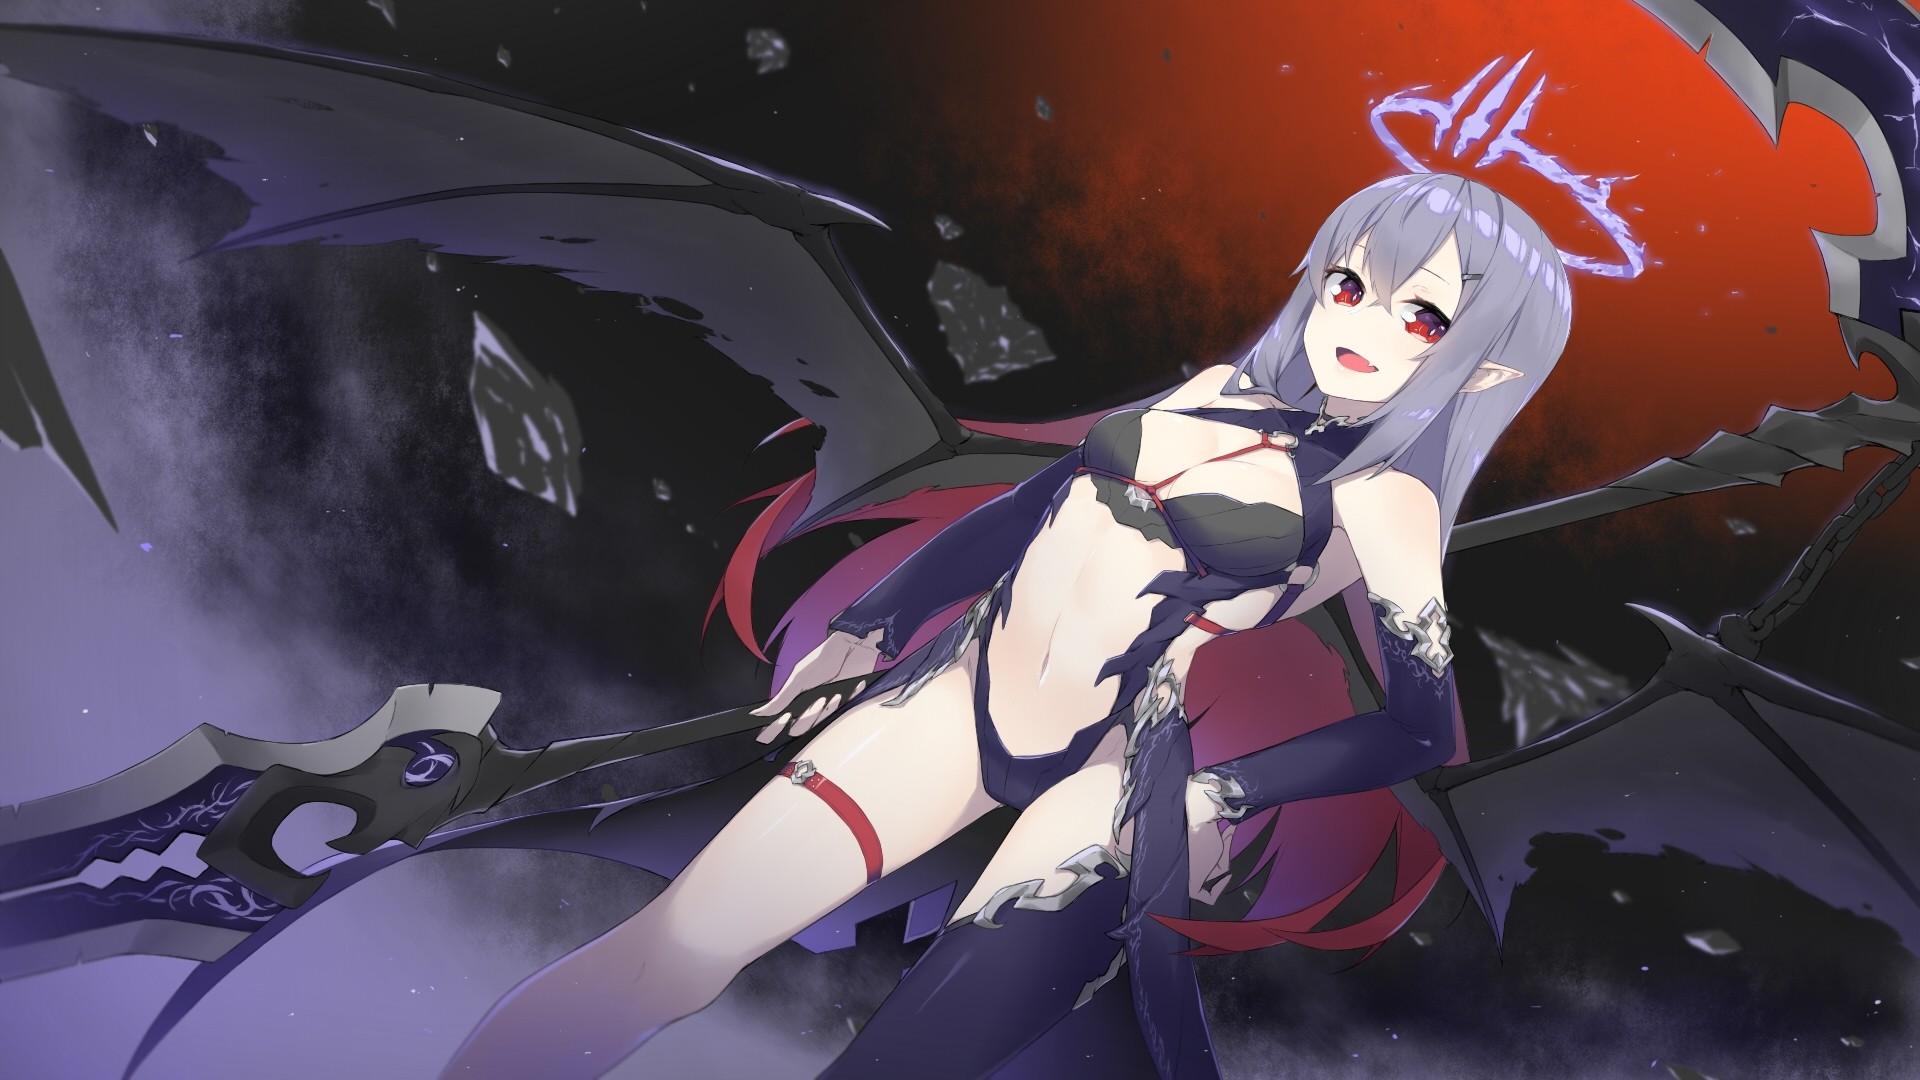 Anime Ecchi hd wallpaper